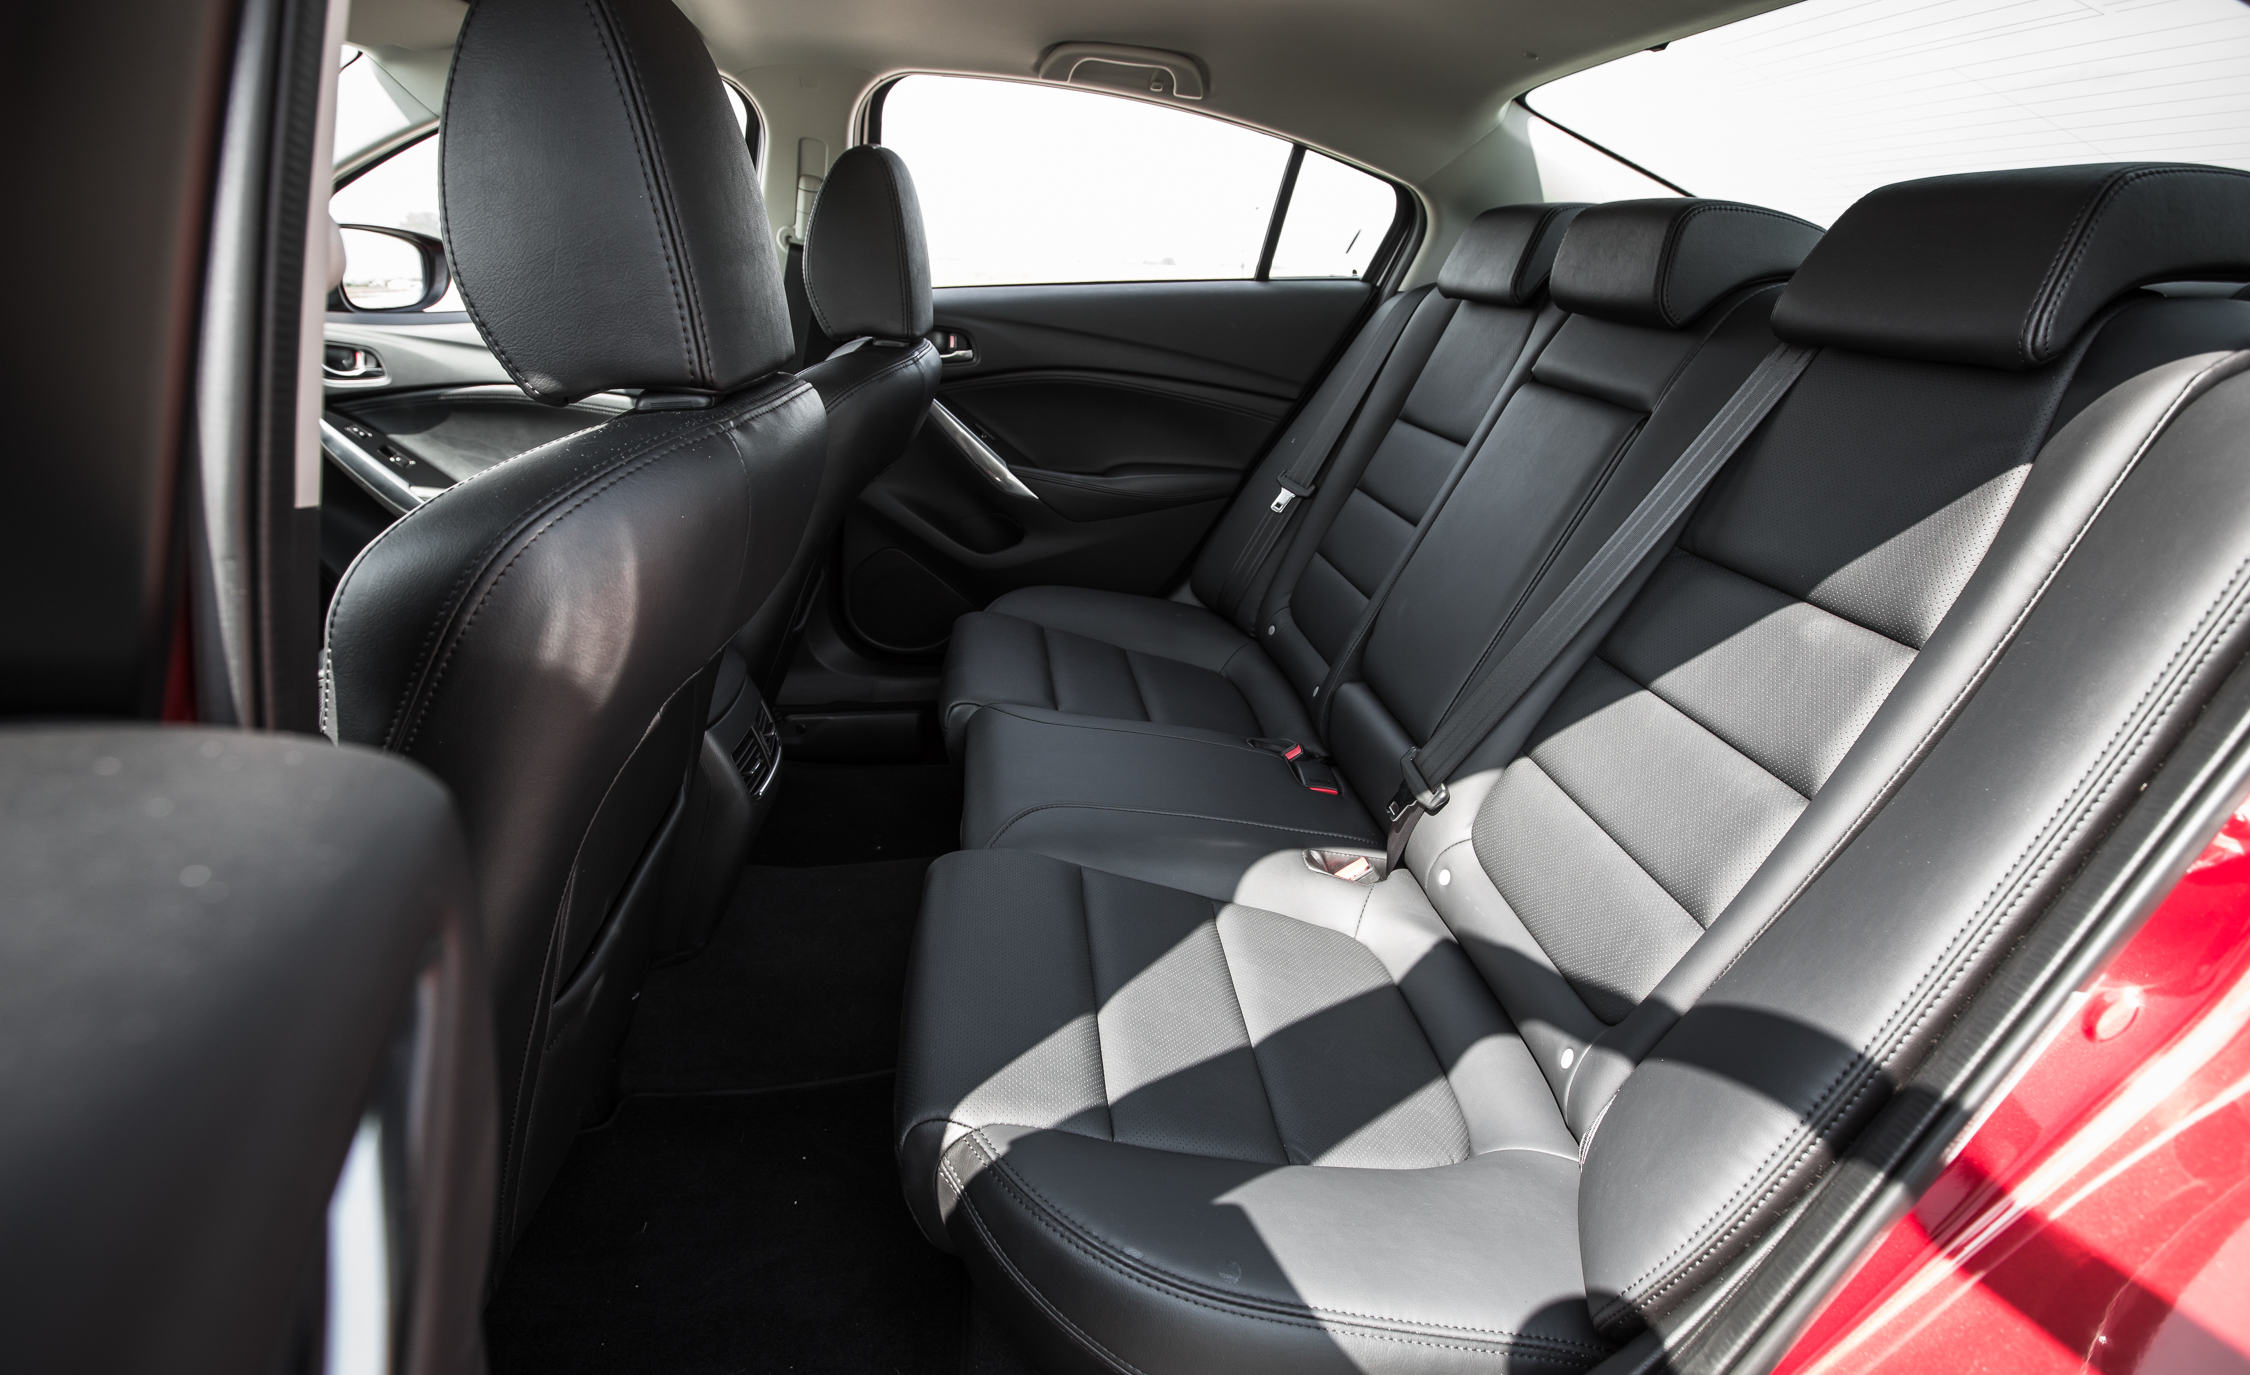 2016 Mazda 6 Touring Interior Rear Passenger Seats